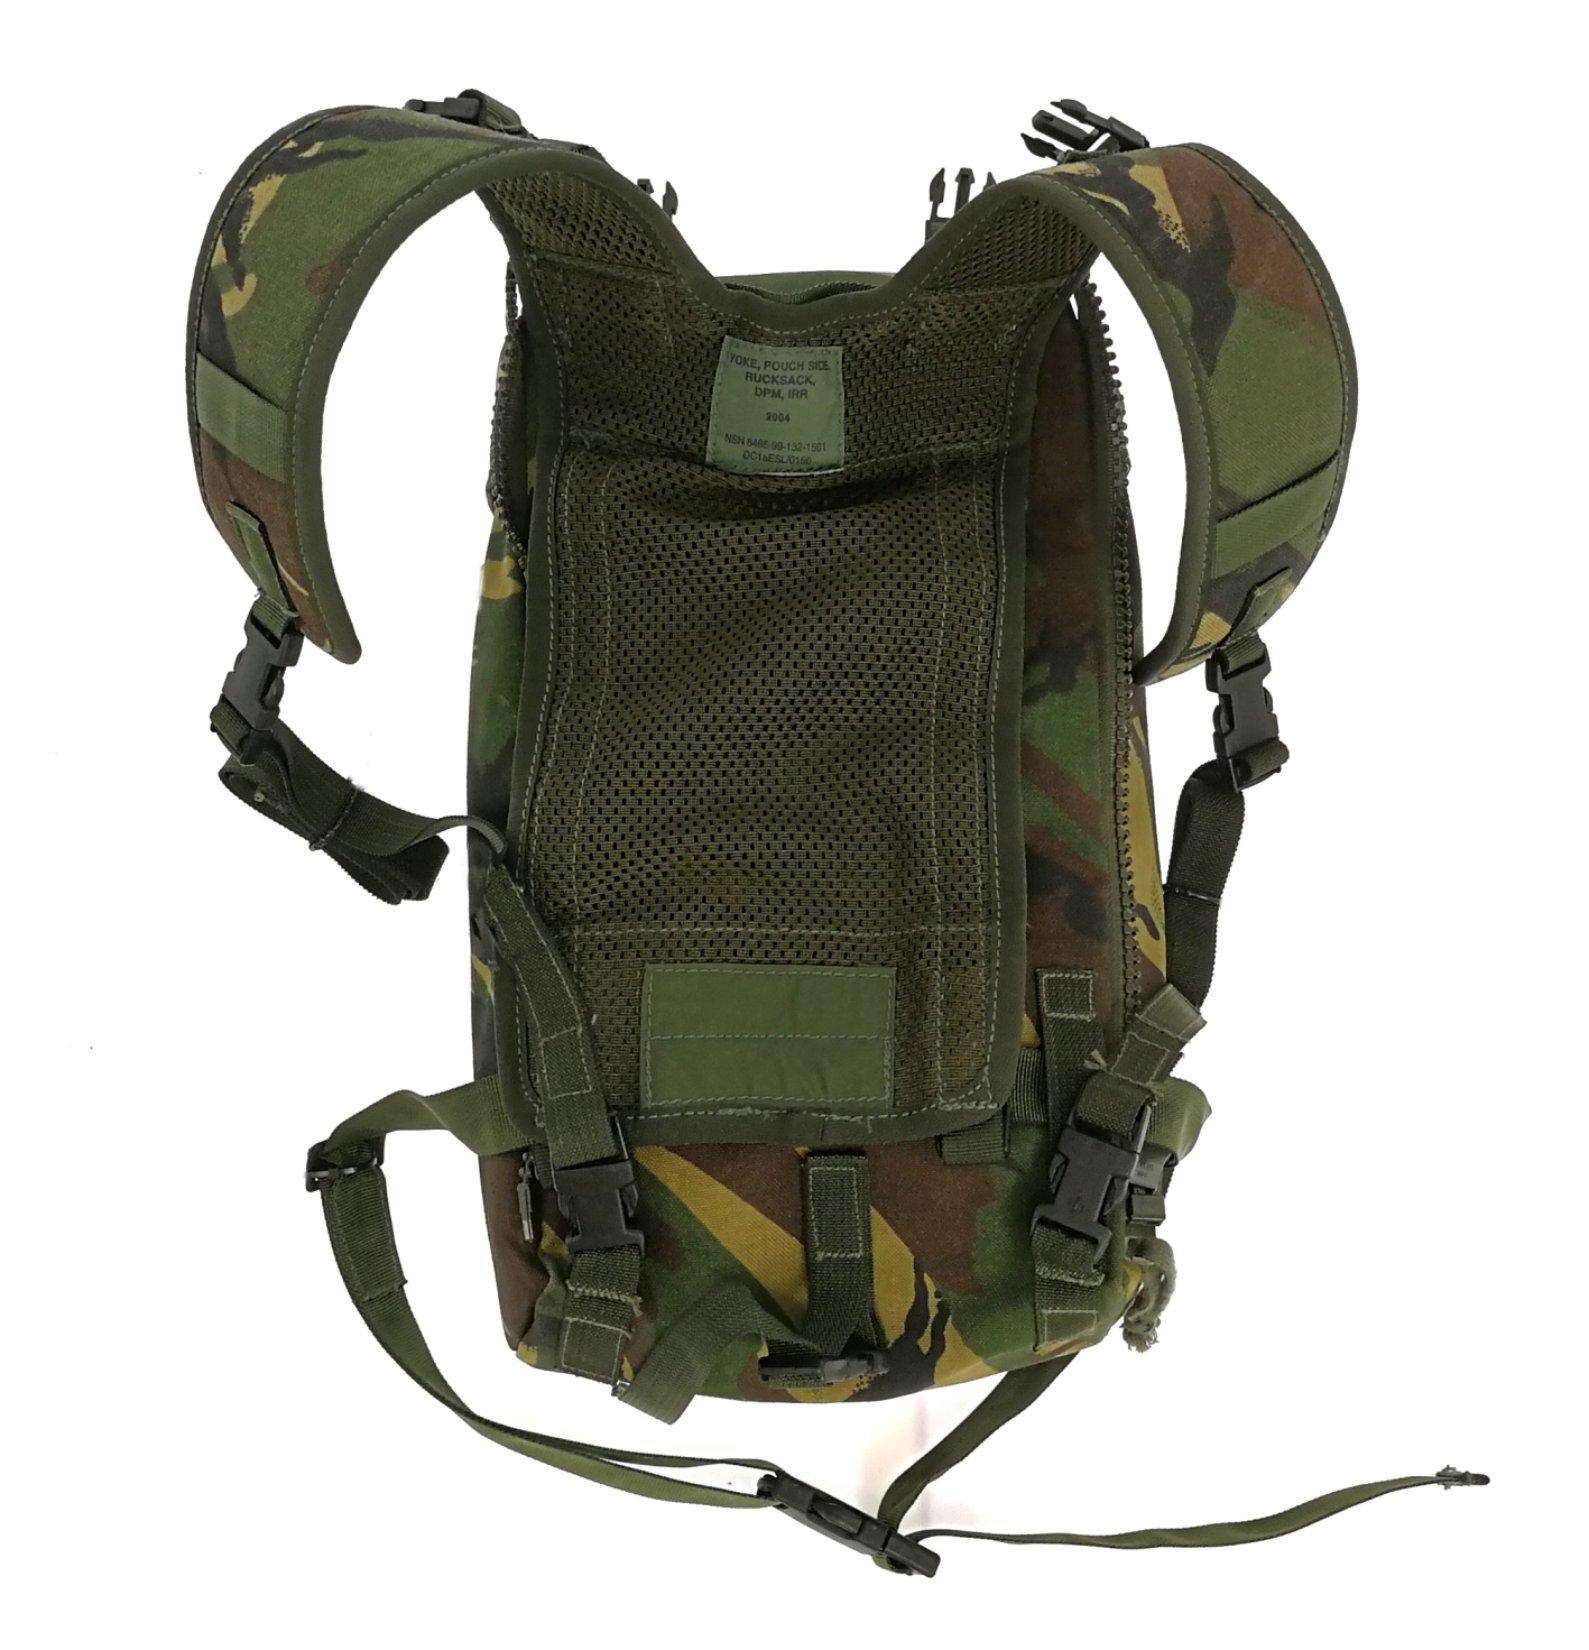 военный рюкзак SIDE POUCH DPM WAR II